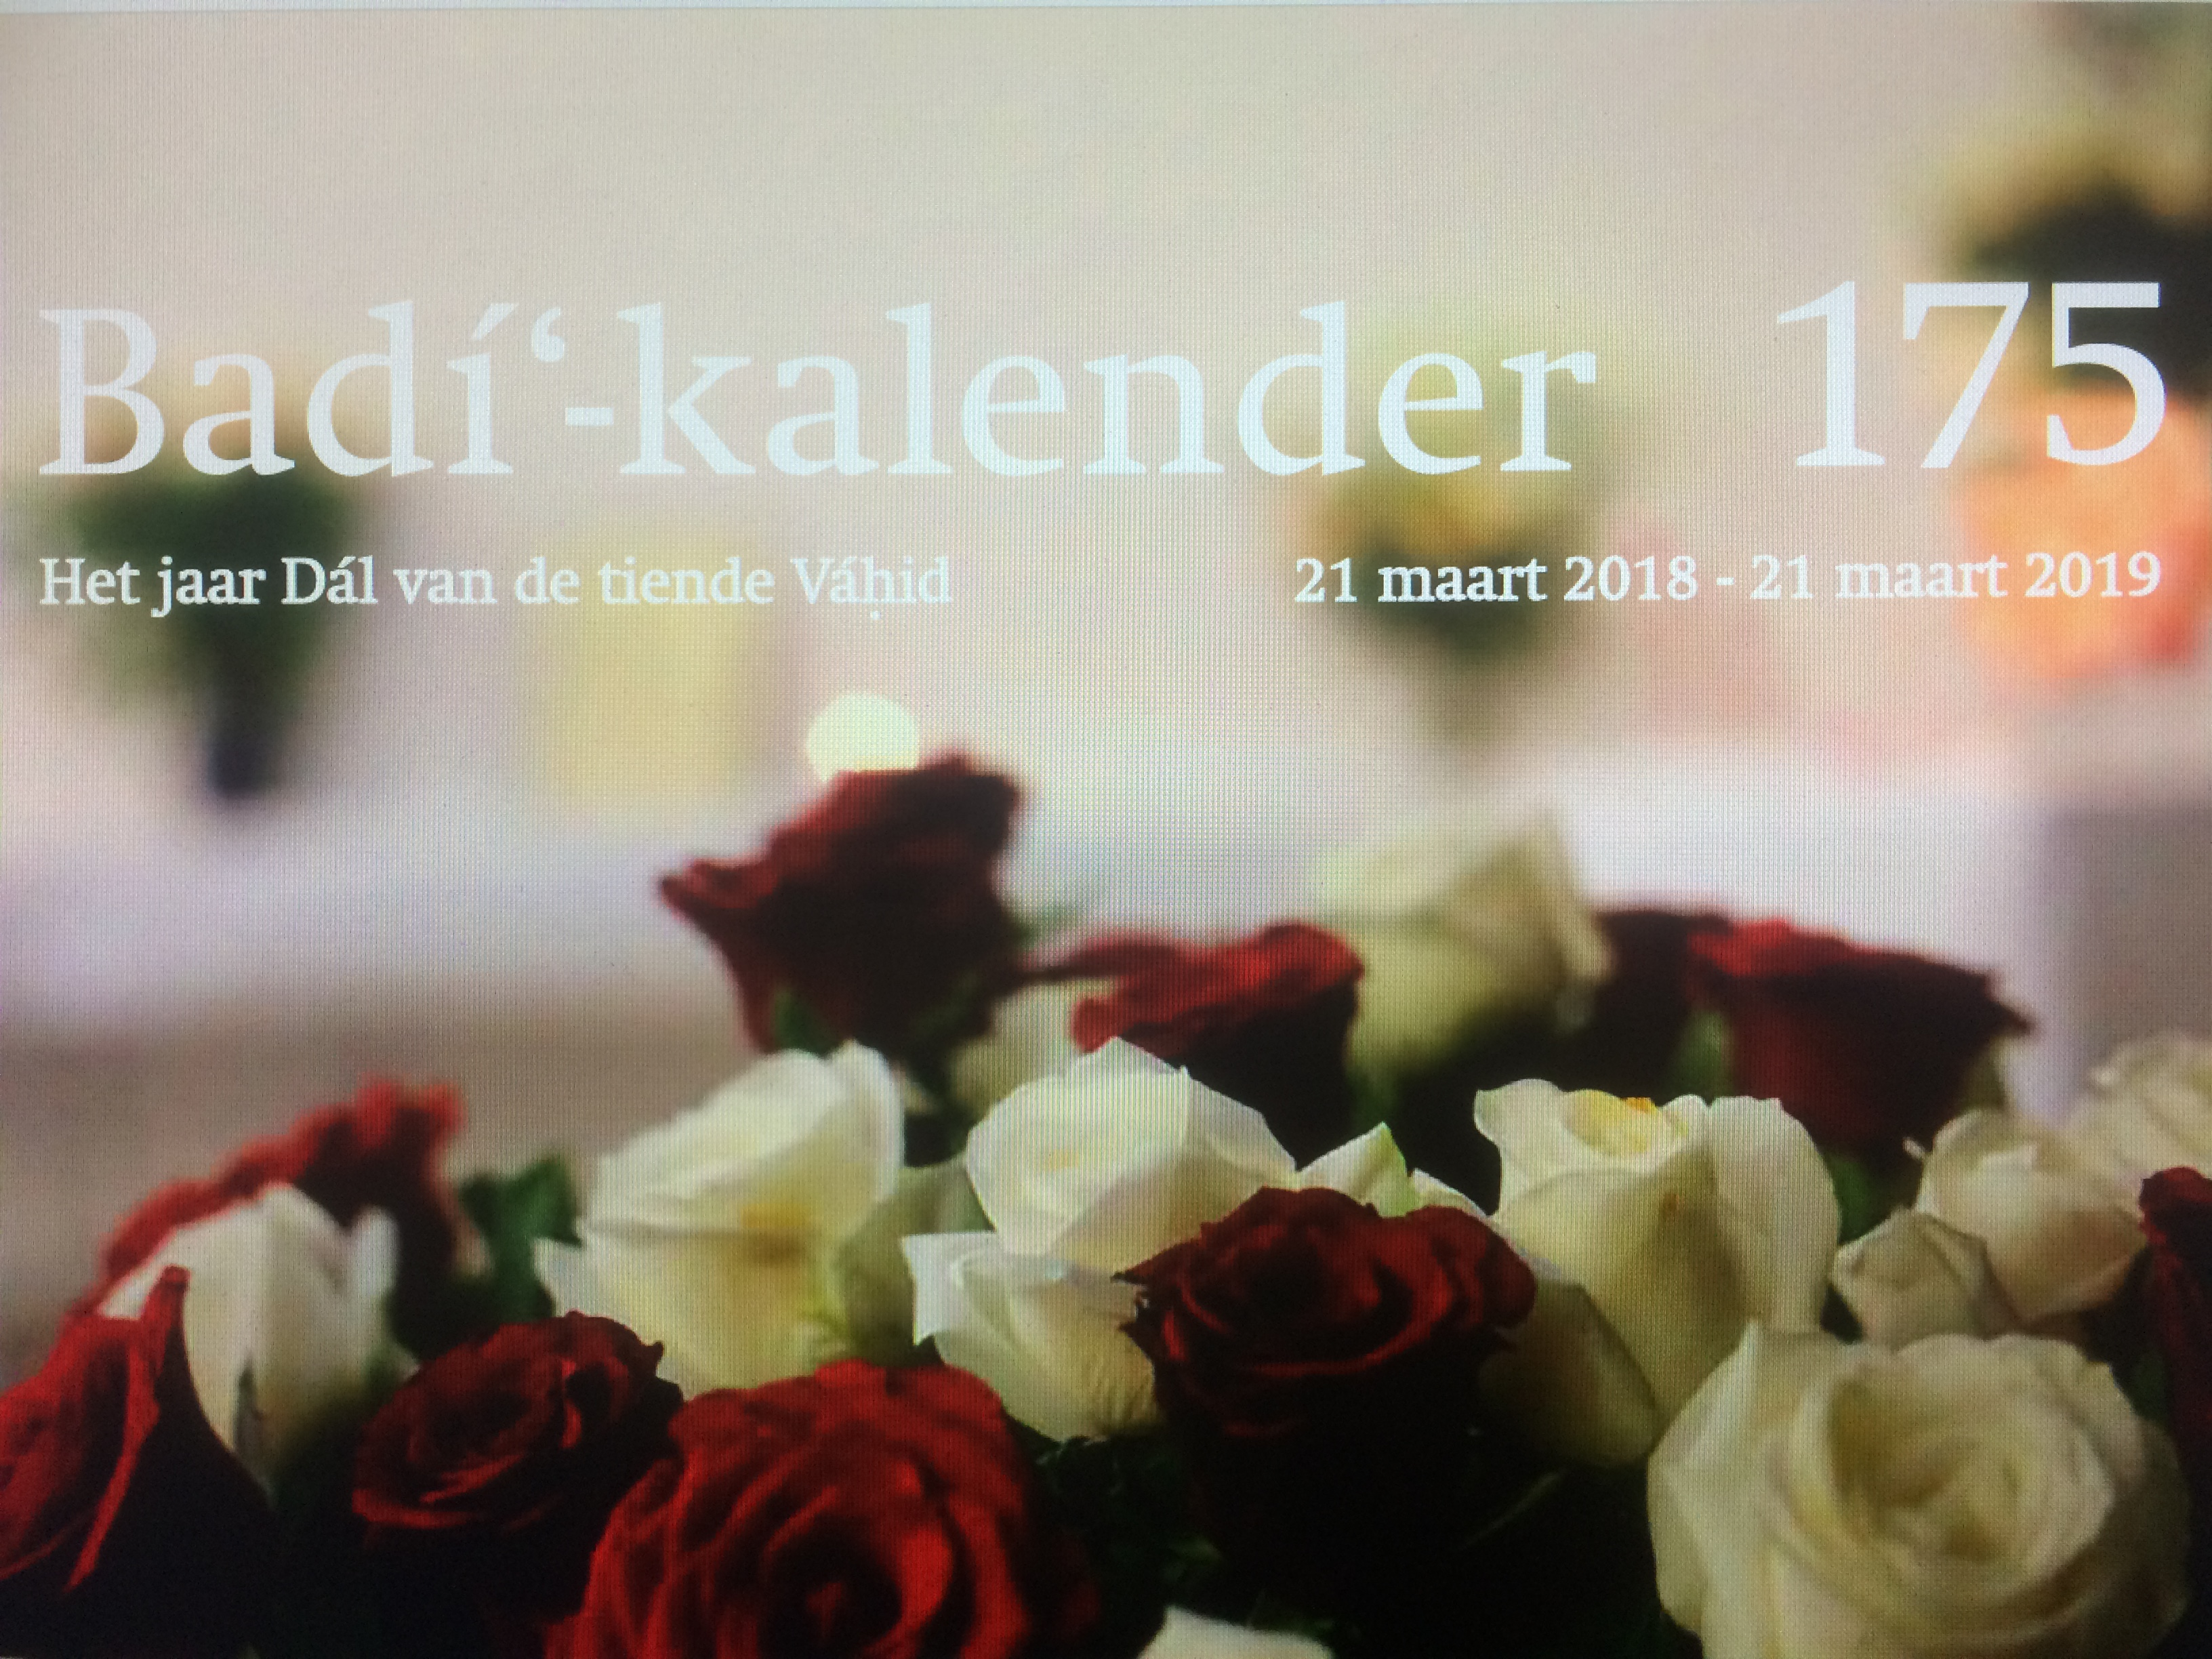 Badí-kalender 175 BE